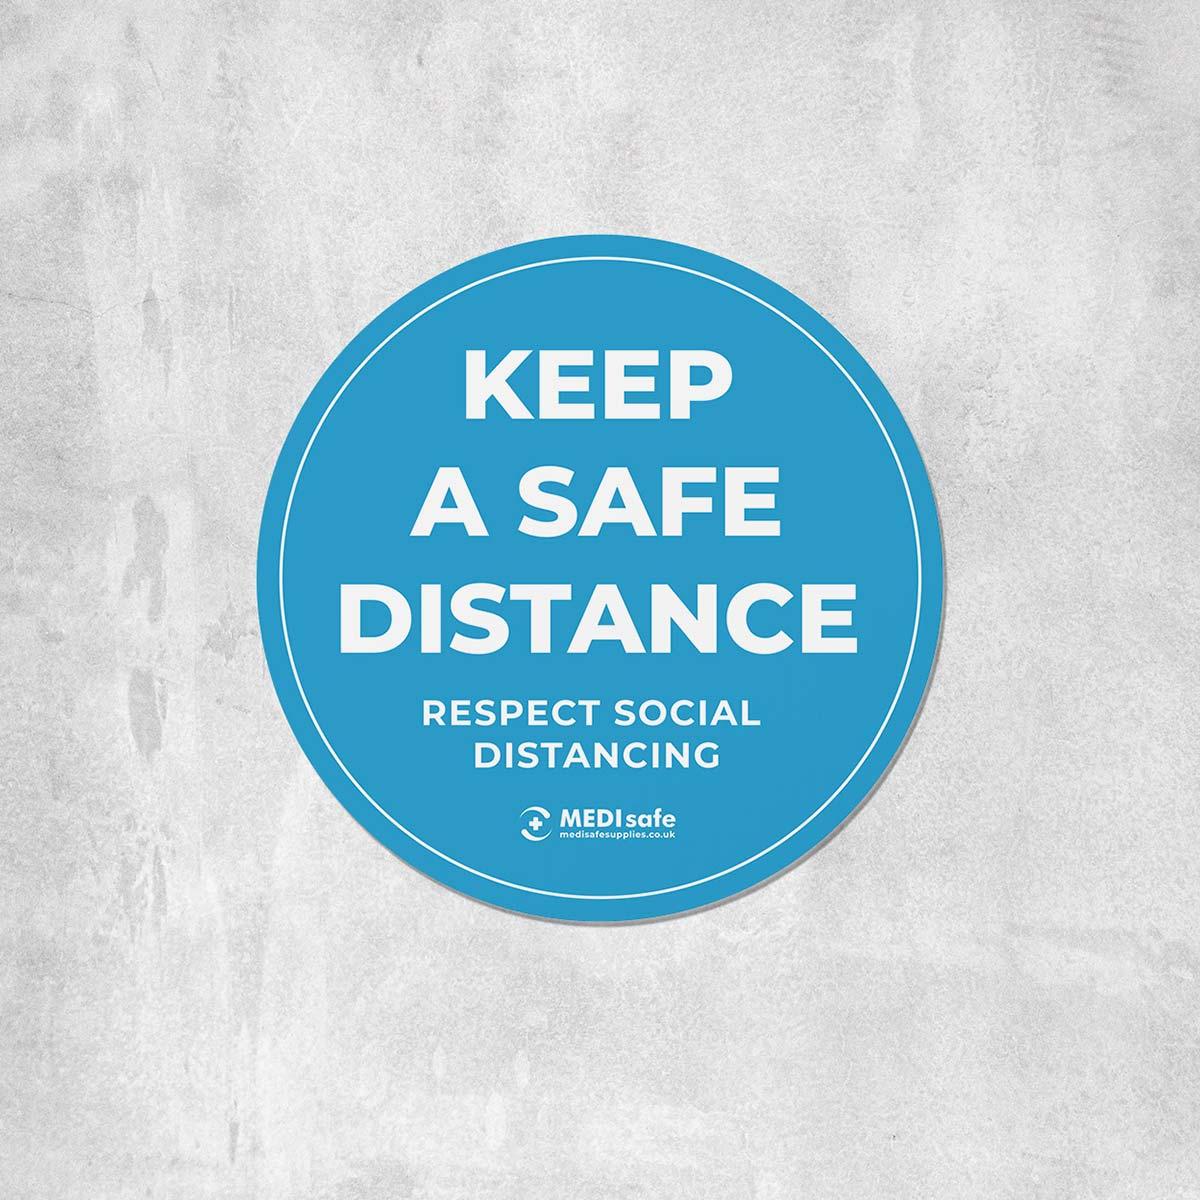 Keep a safe distance floor sticker for social distancing - blue